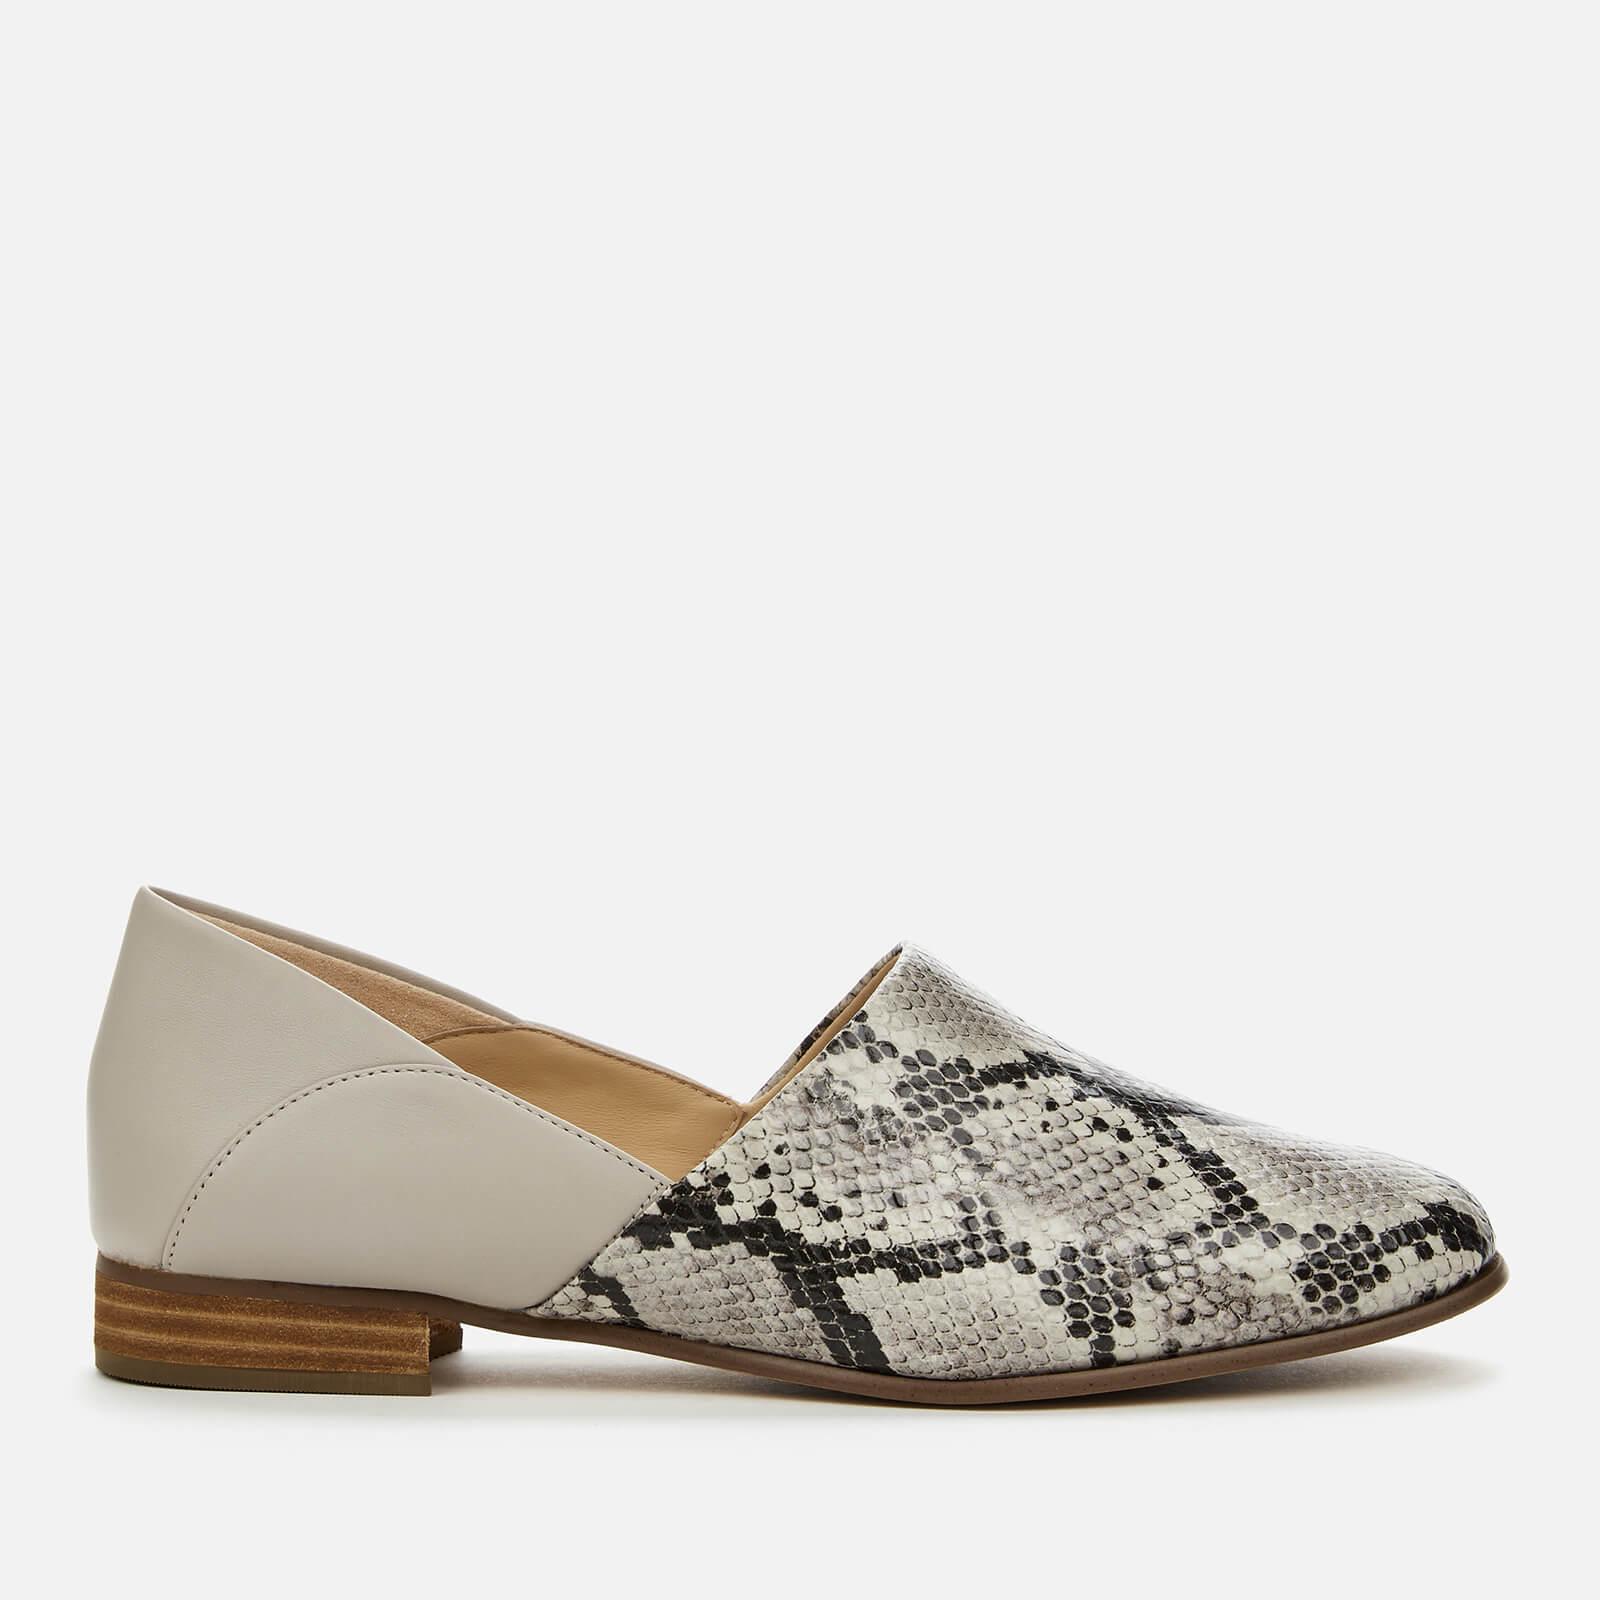 Clarks Women's Pure Tone Flat Shoes - Grey Snake - UK 5